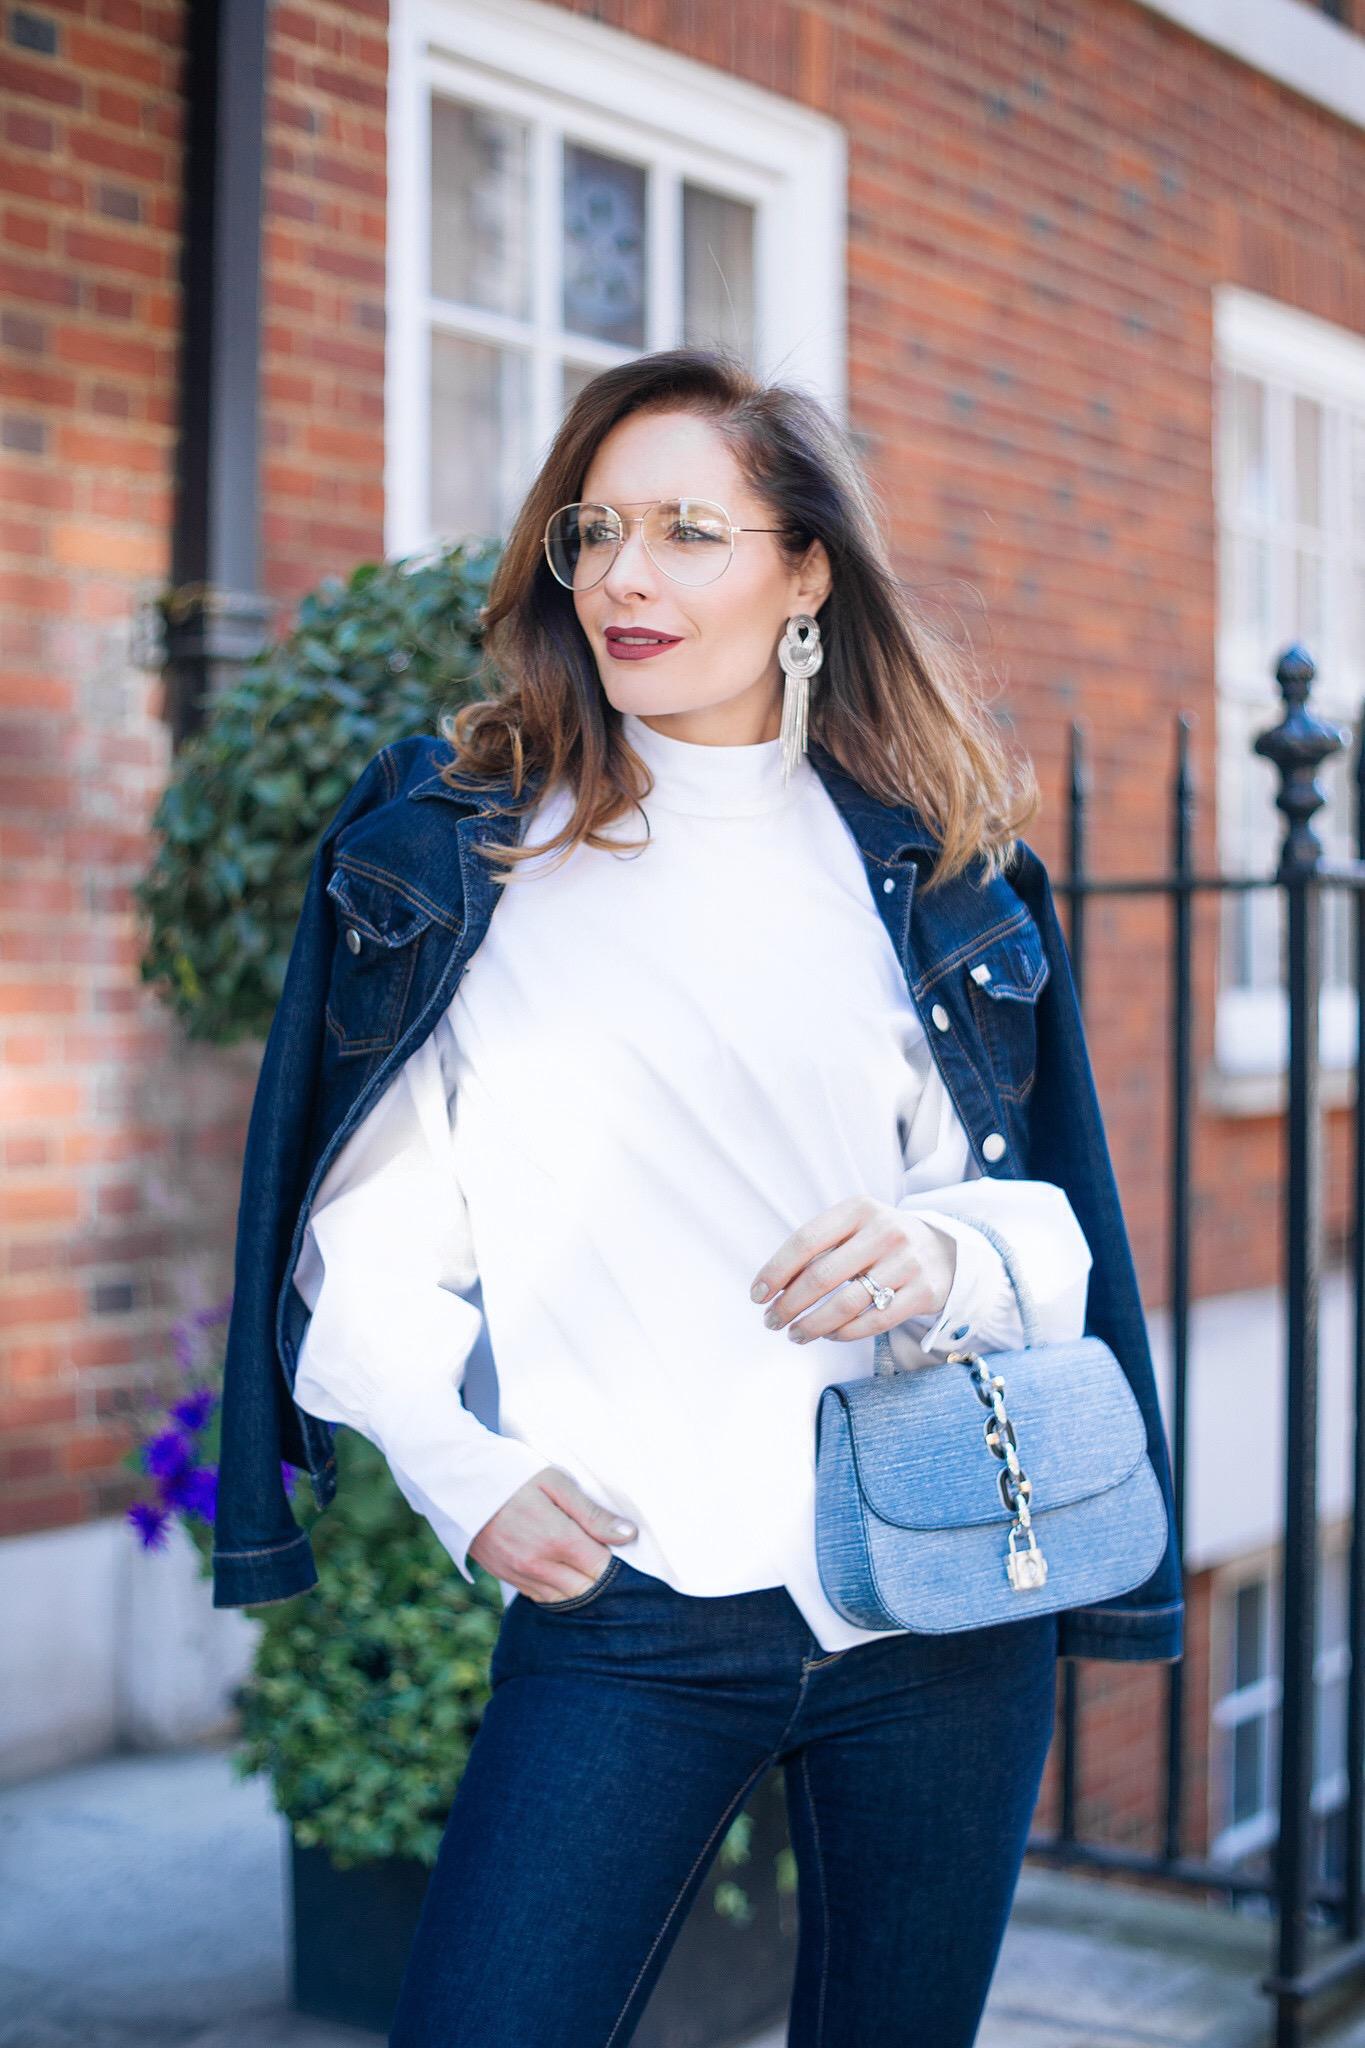 Petra from Chic Journal wears Lara Bohinc earrings and Louis Vuitton Chain It Bag